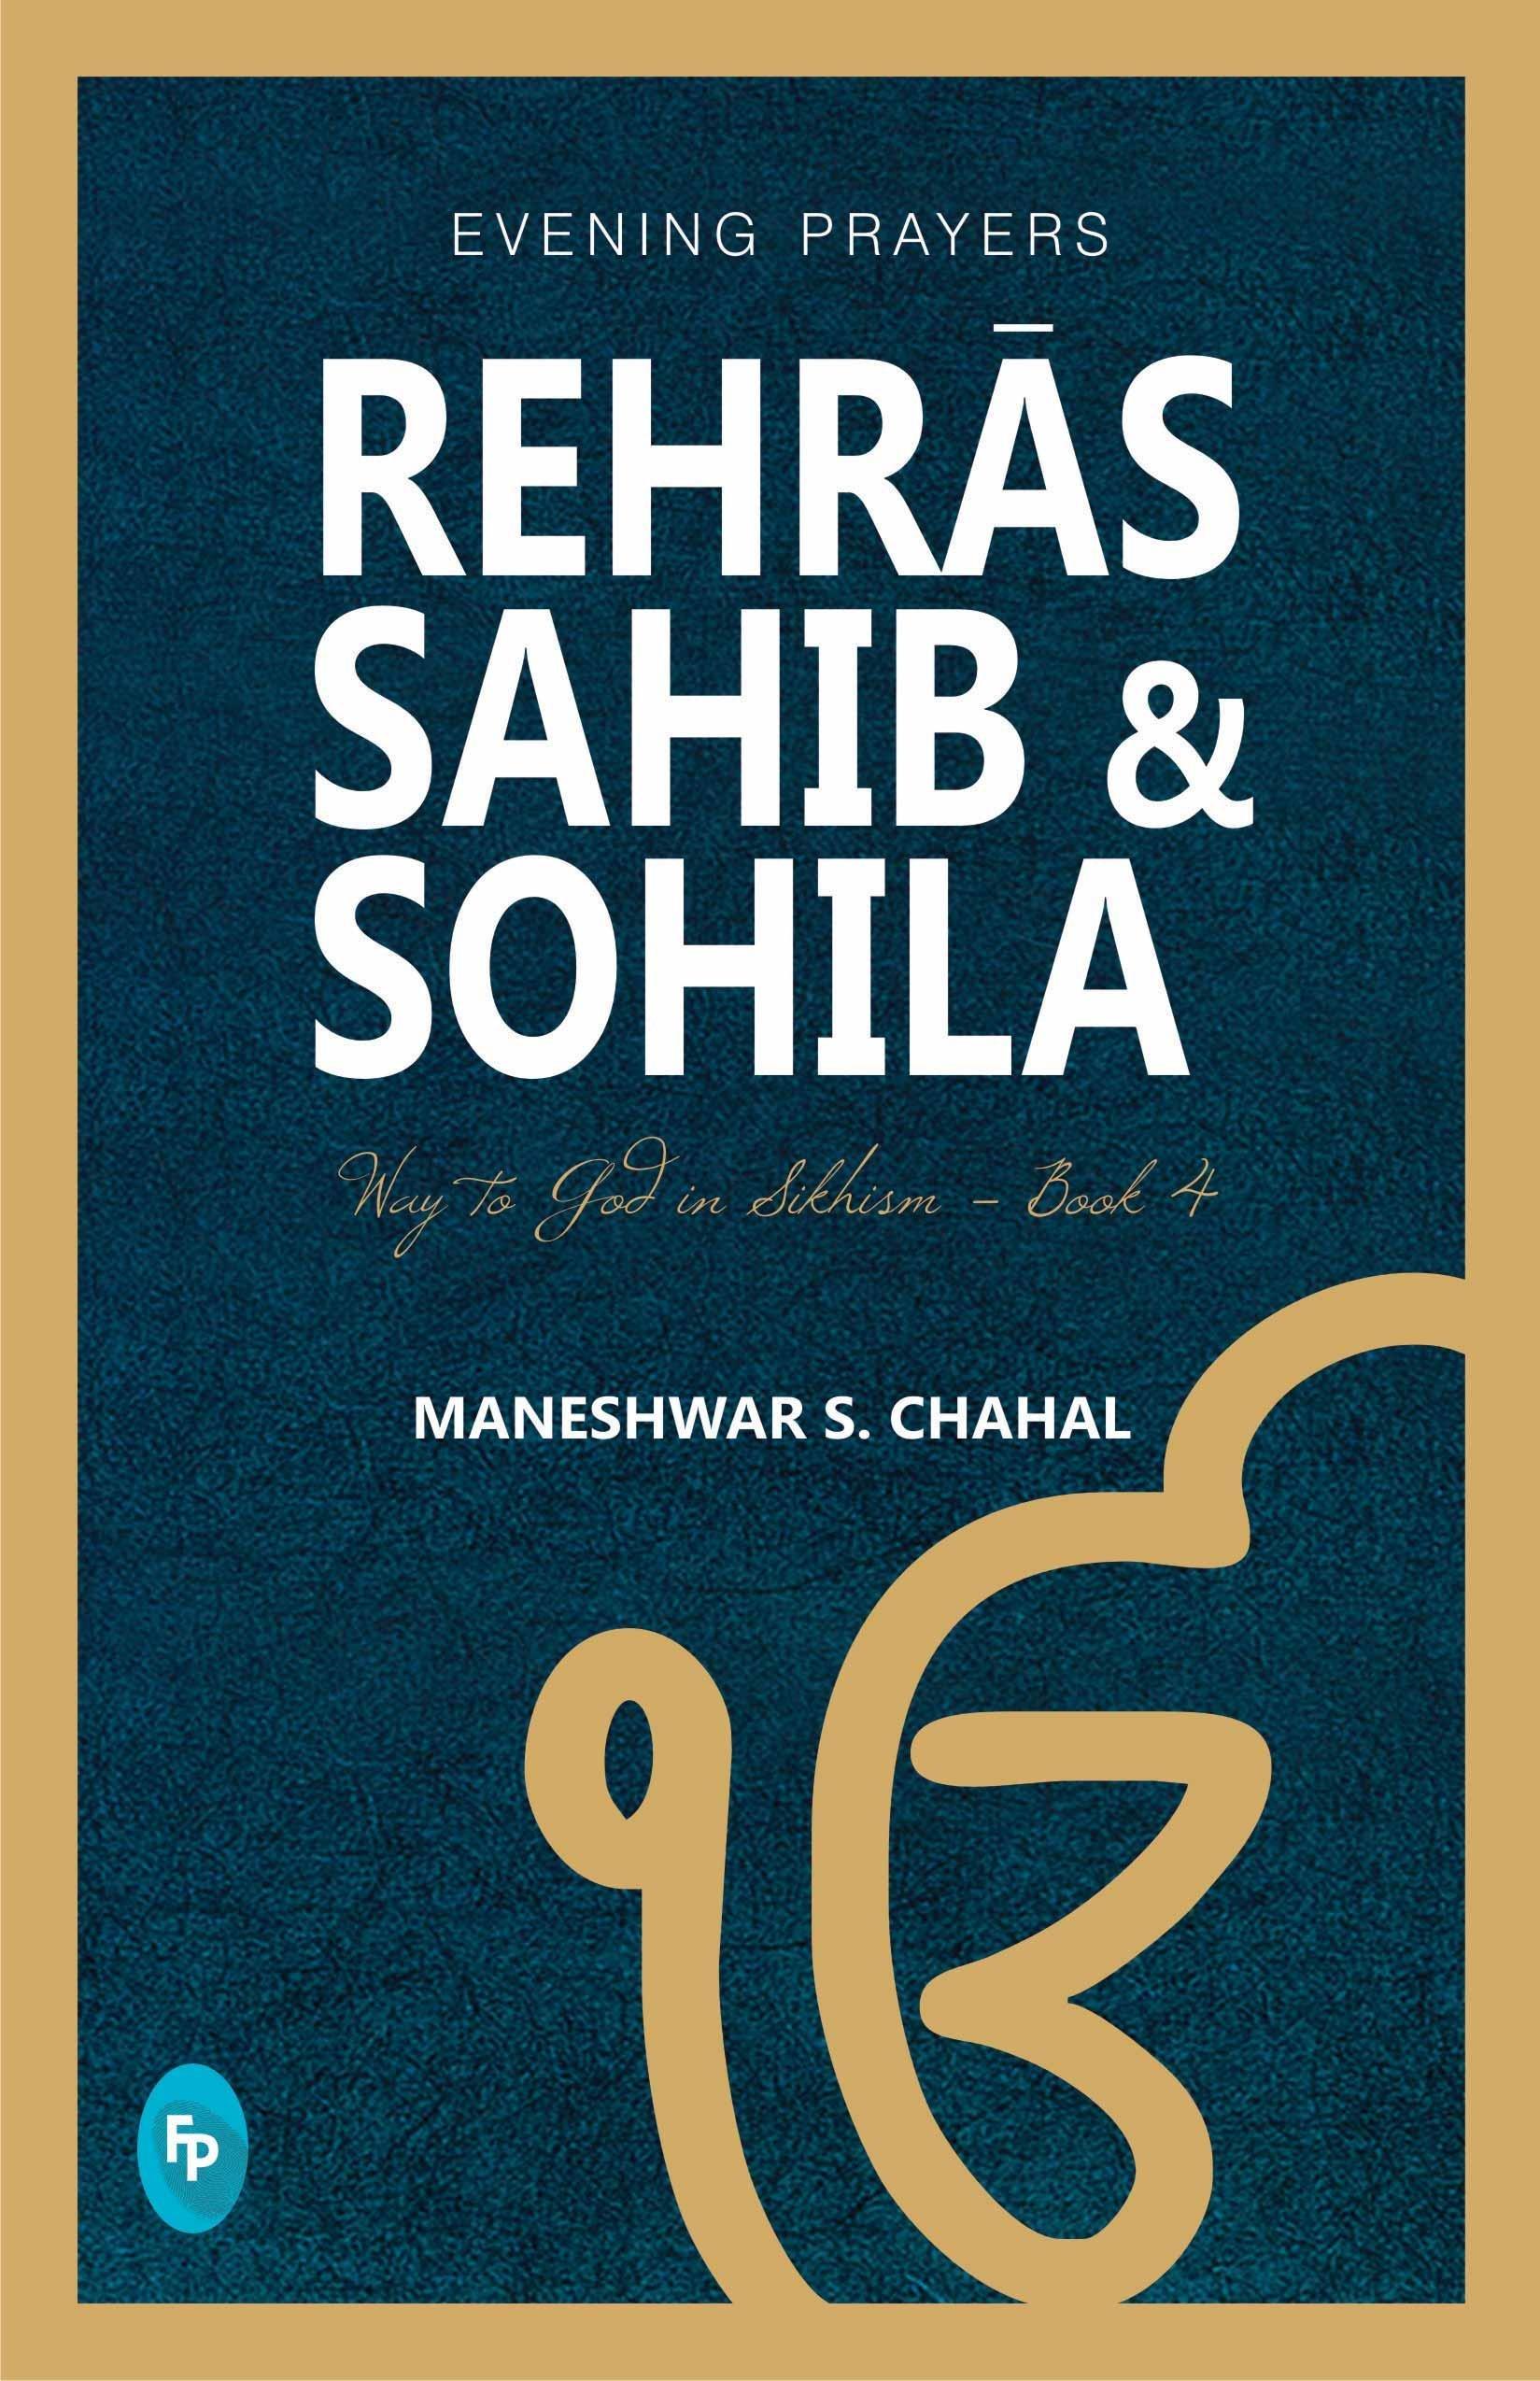 EVENING PRAYERS : REHRAS SAHIB & SOHILA  :  WAY TO GOD IN SIKHISM - BOOK 4